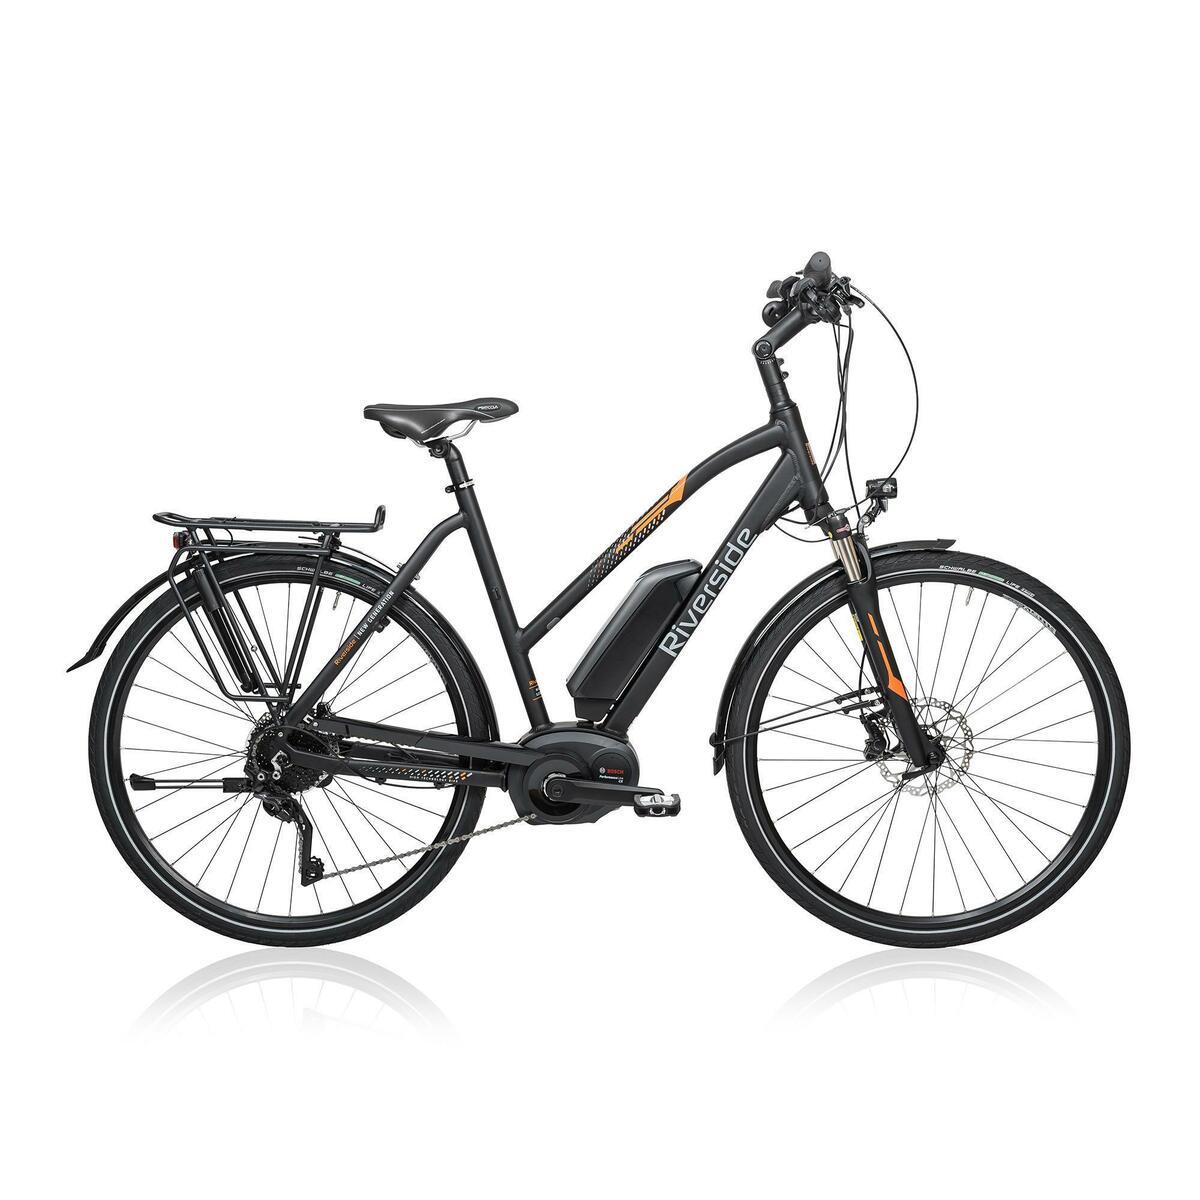 Bild 1 von E-Bike 28 Trekkingrad Riverside 700 Damen Performance CX 500Wh anthrazit/orange